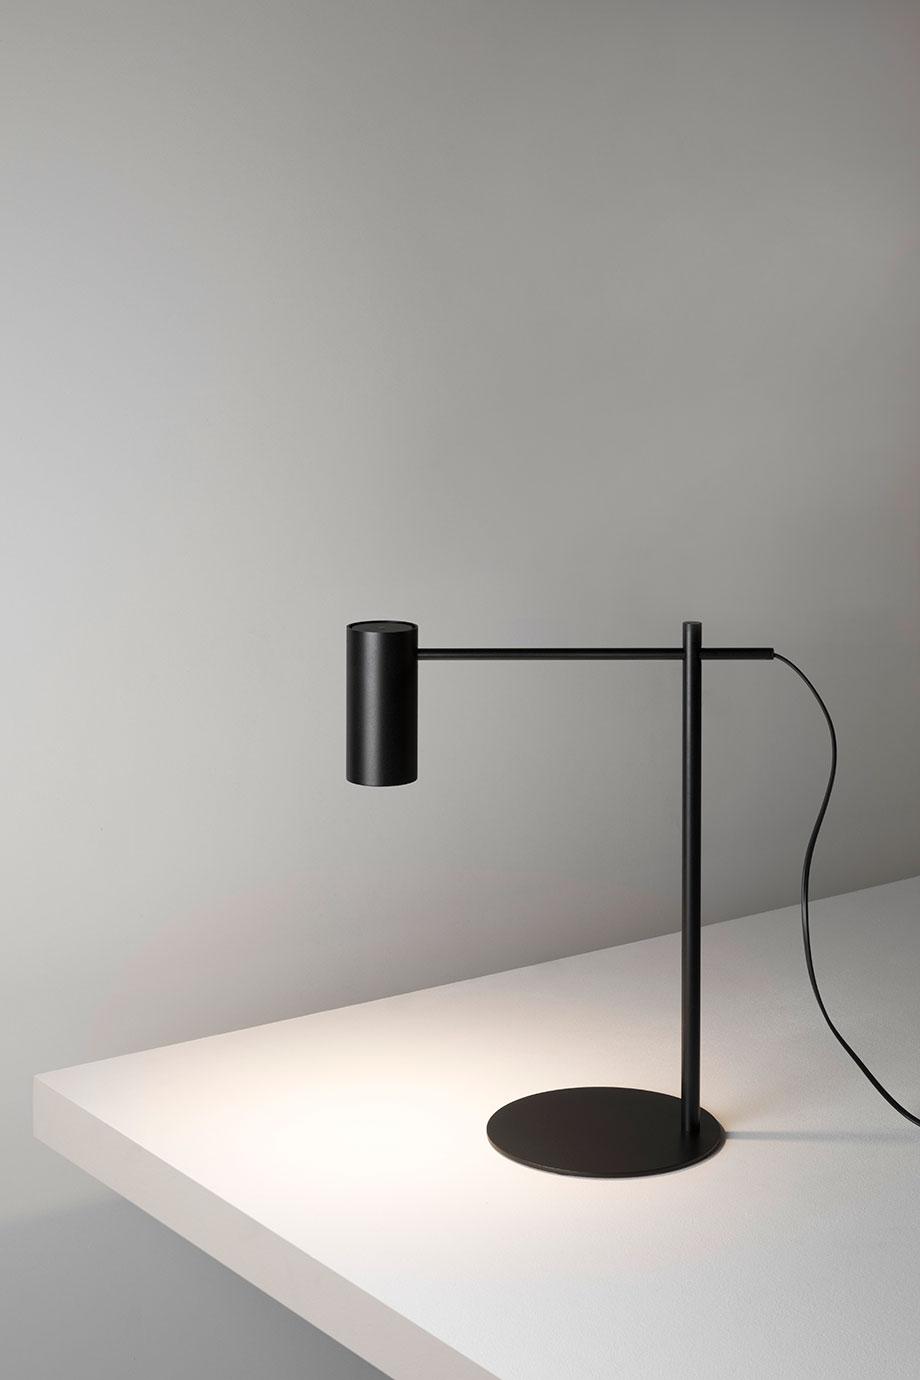 lamparas cyls de mermelada estudio para estiluz (4)